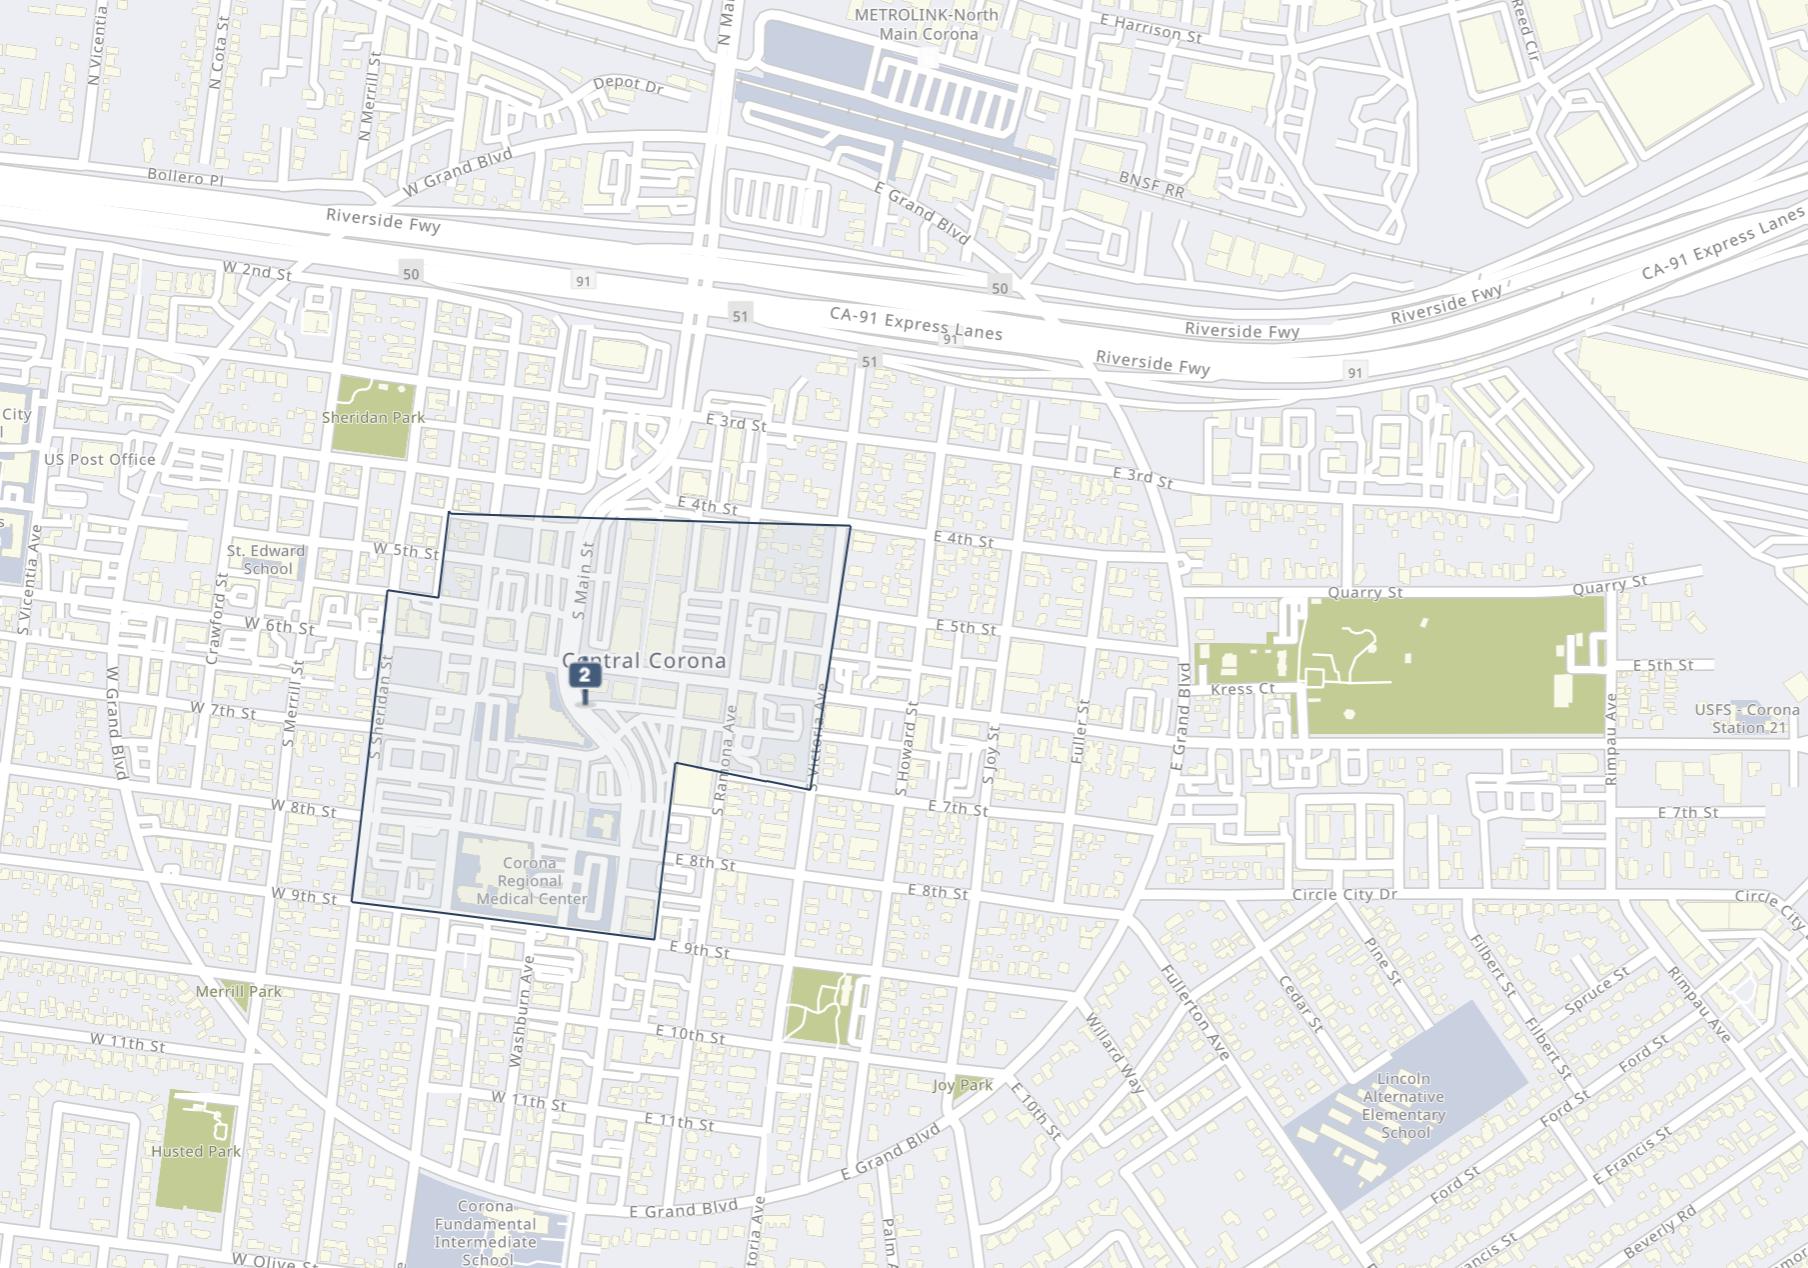 Screen Shot bird eye view of map illustration